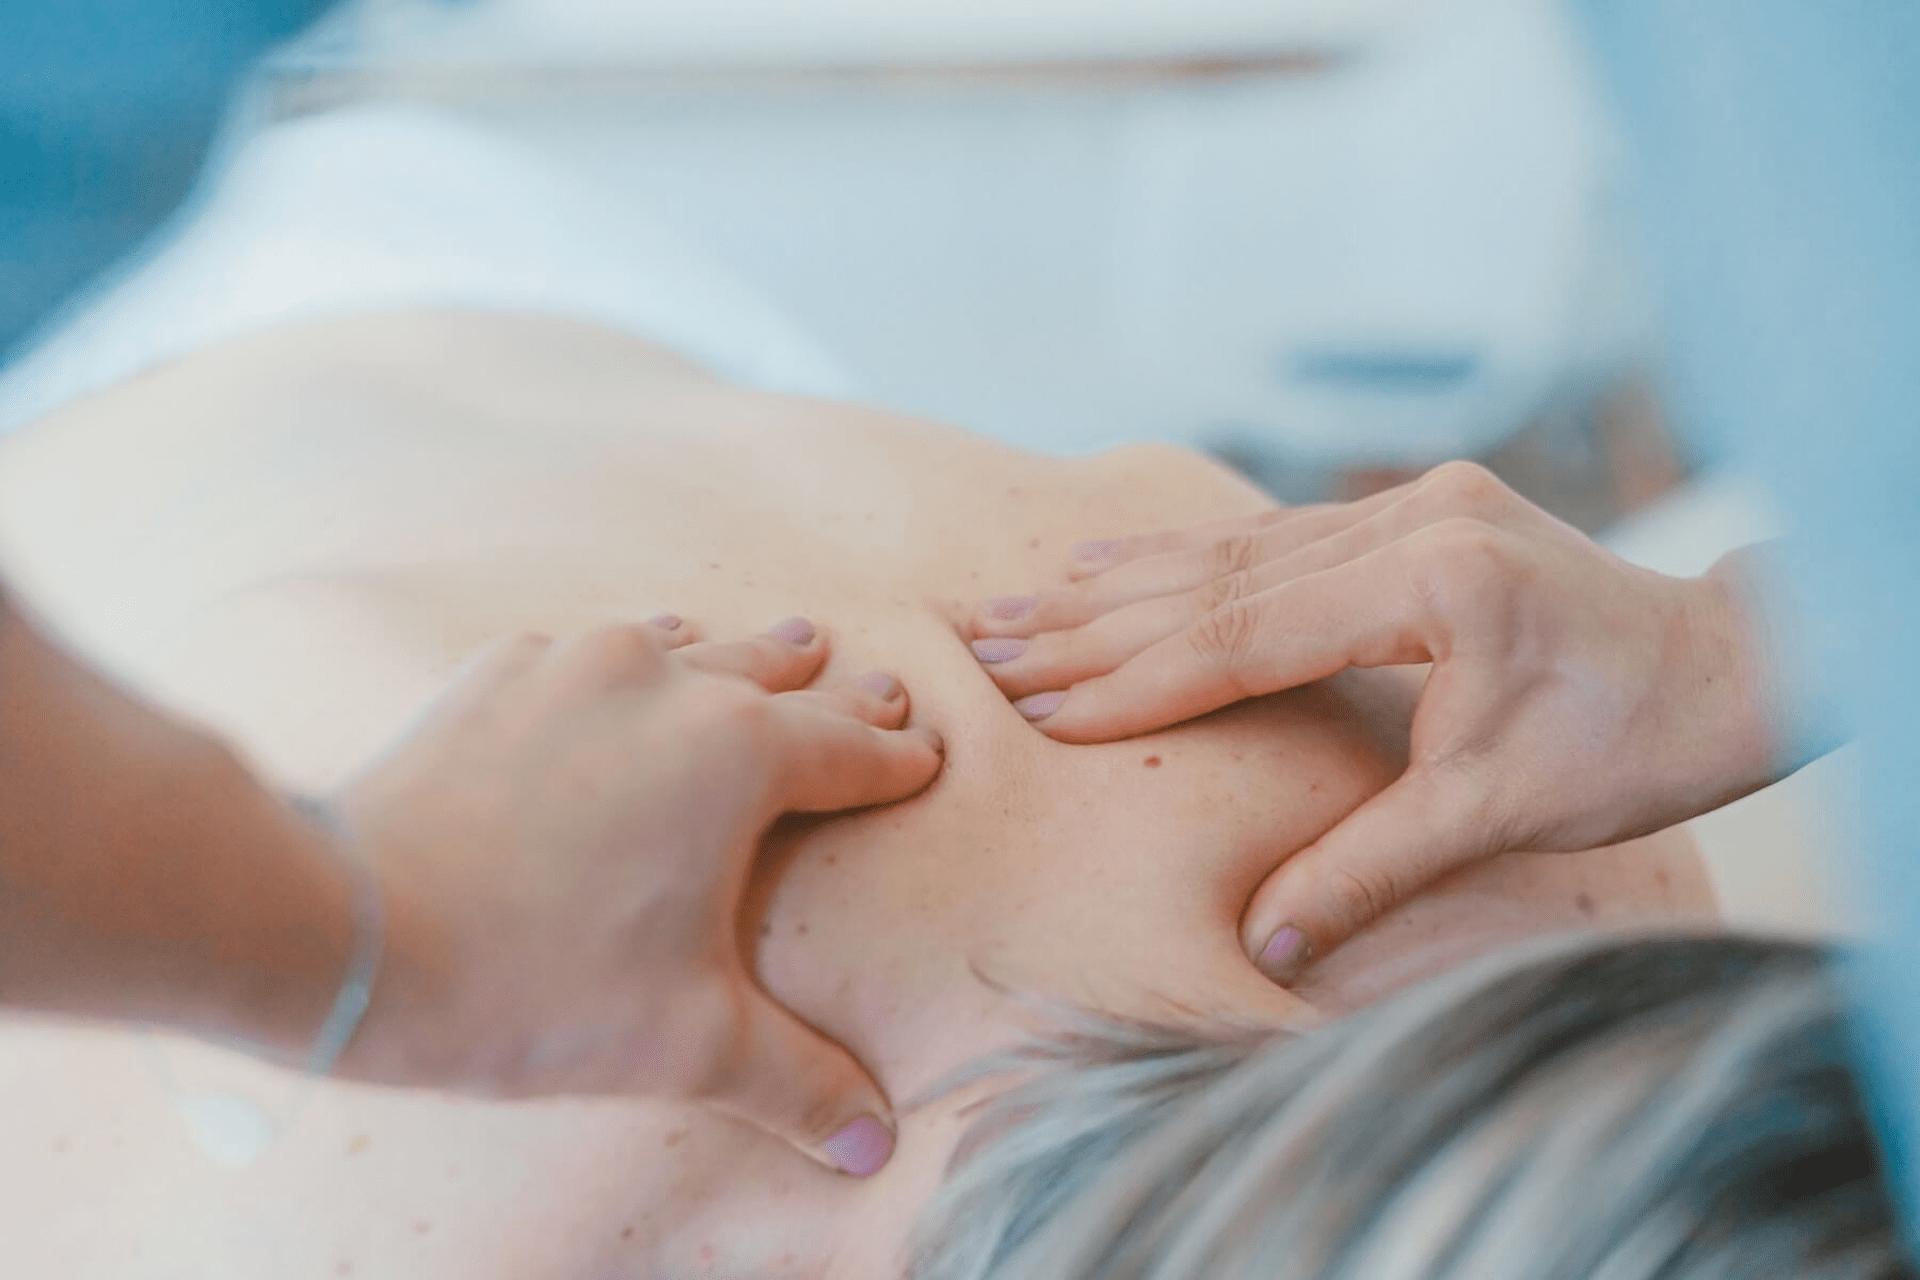 massage Massage Therapist in The Woodlands